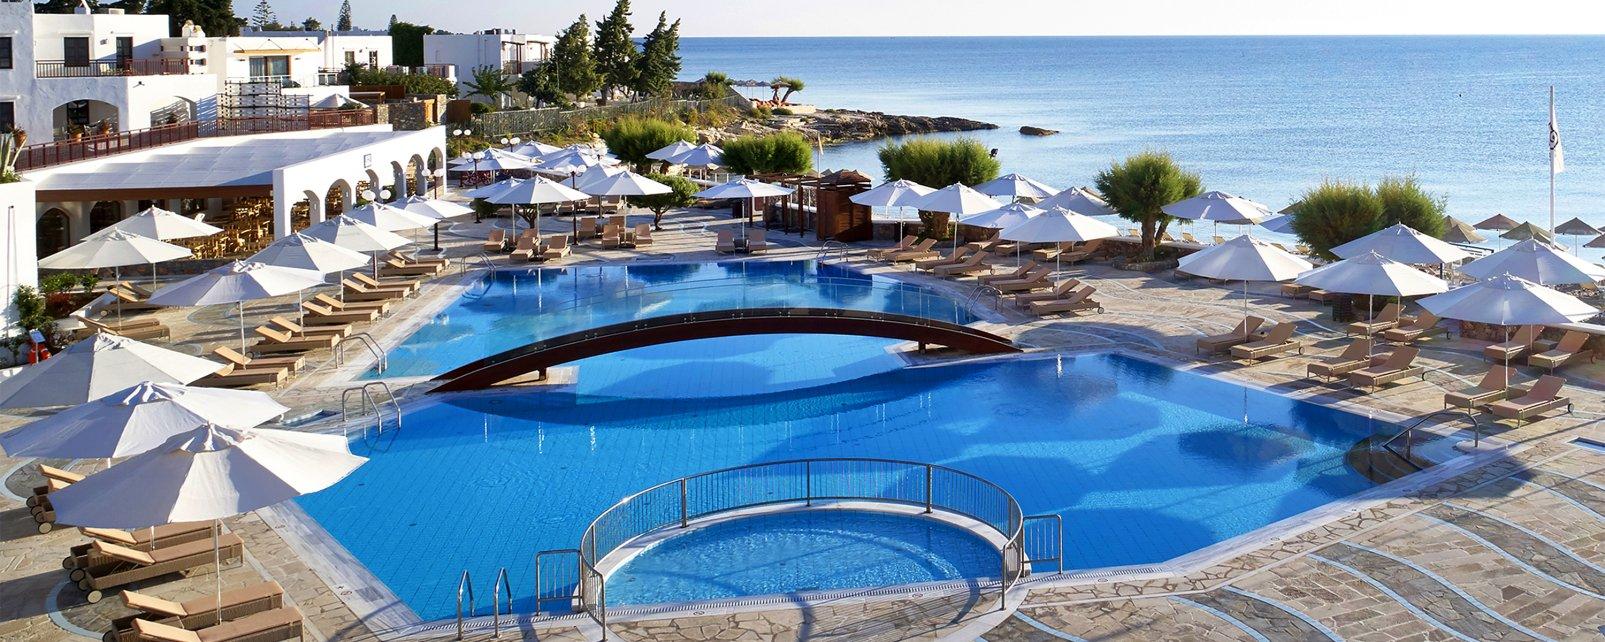 Hôtel Creta Maris